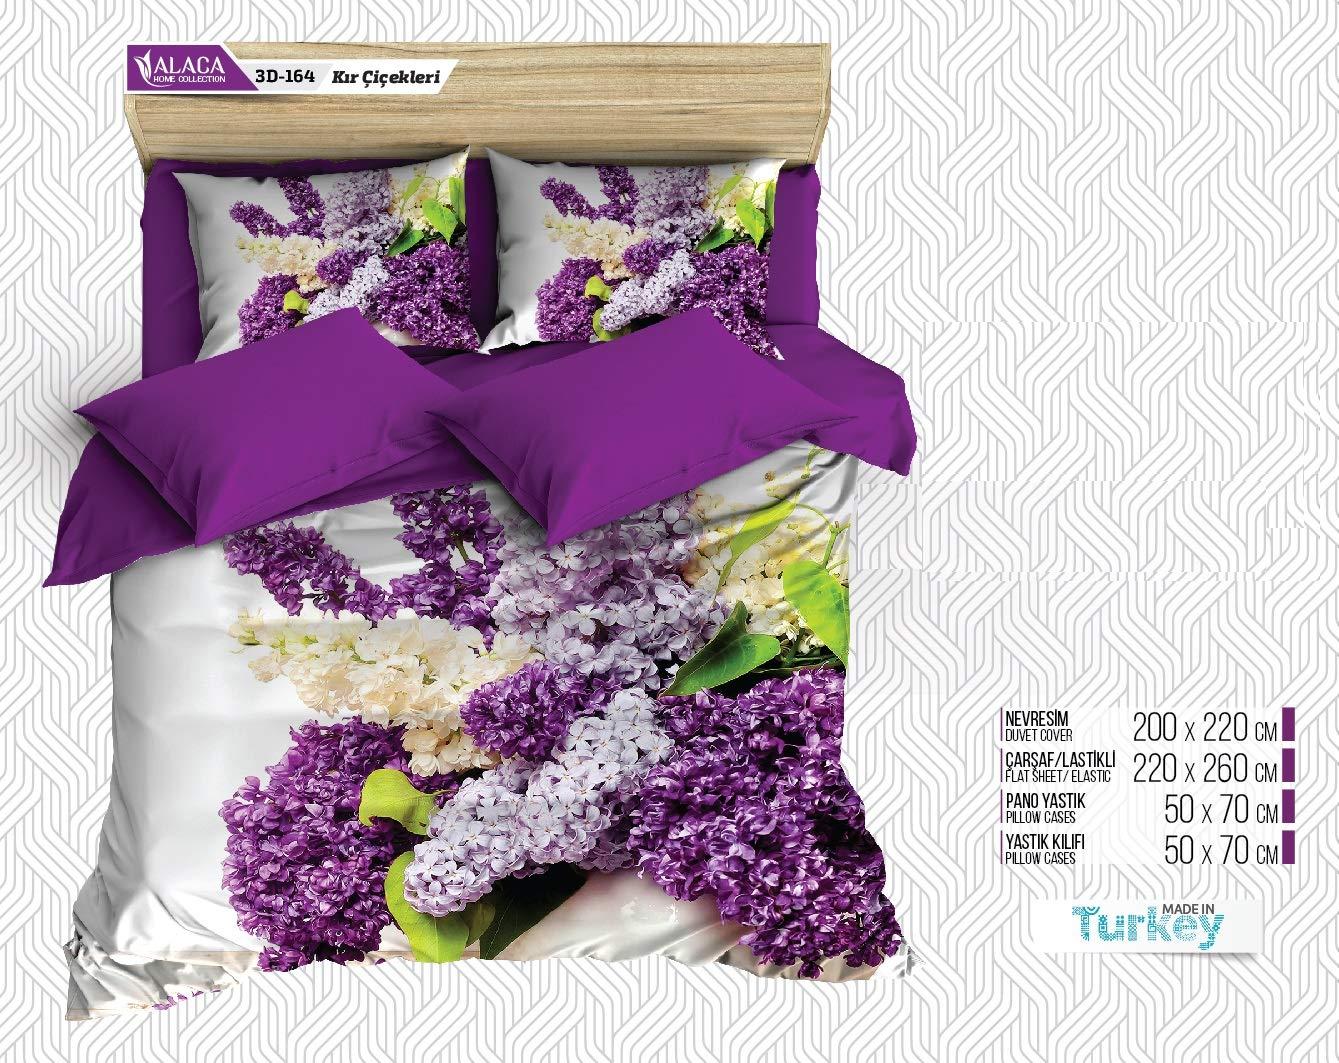 Estilo lençóis 6 peça turco têxtil luxo macio 1800 séries premium lençóis de cama conjunto,